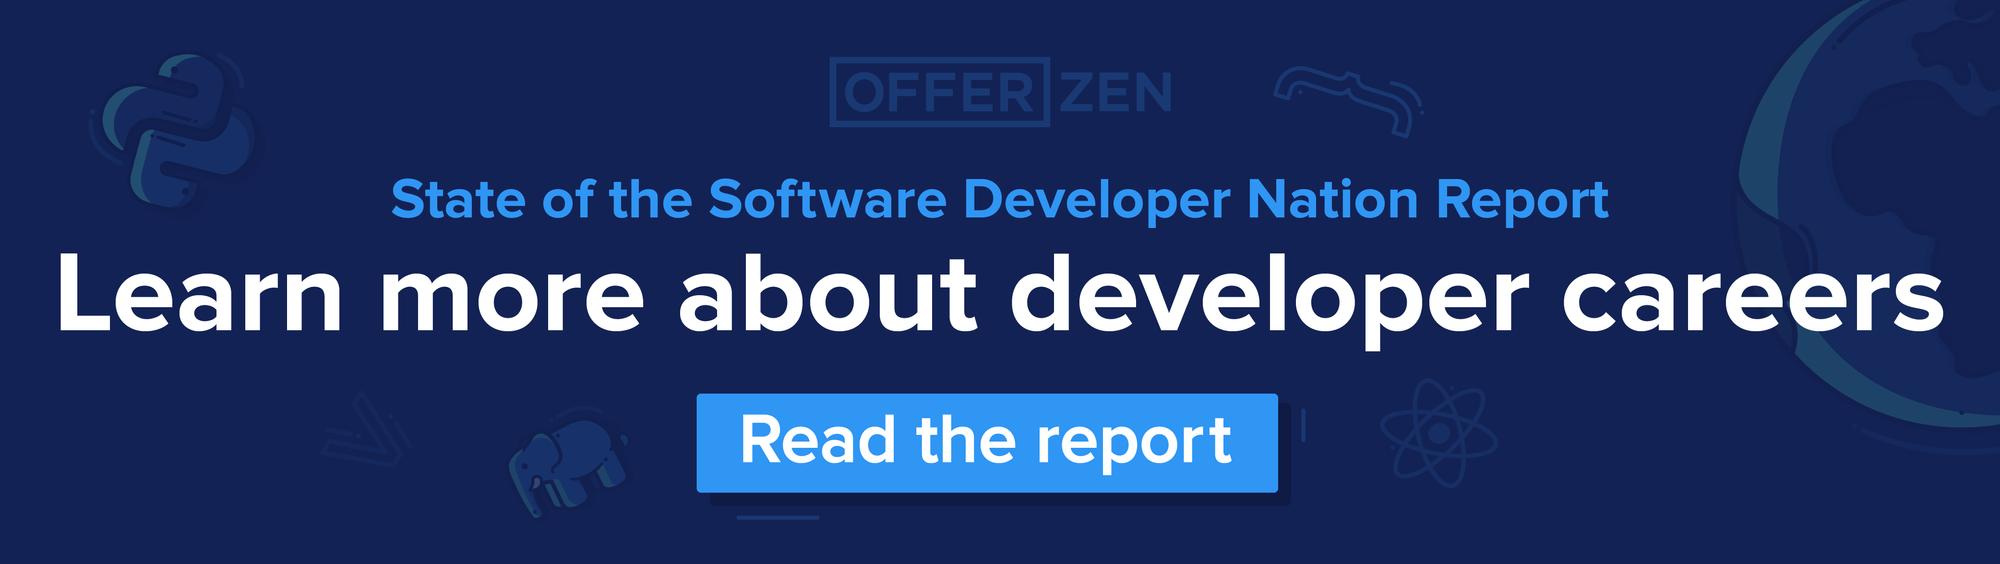 OfferZen_2021_State-of-the-Software-Developer-Nation-Report_Inner-article-CTA_Developer-careers-76-1